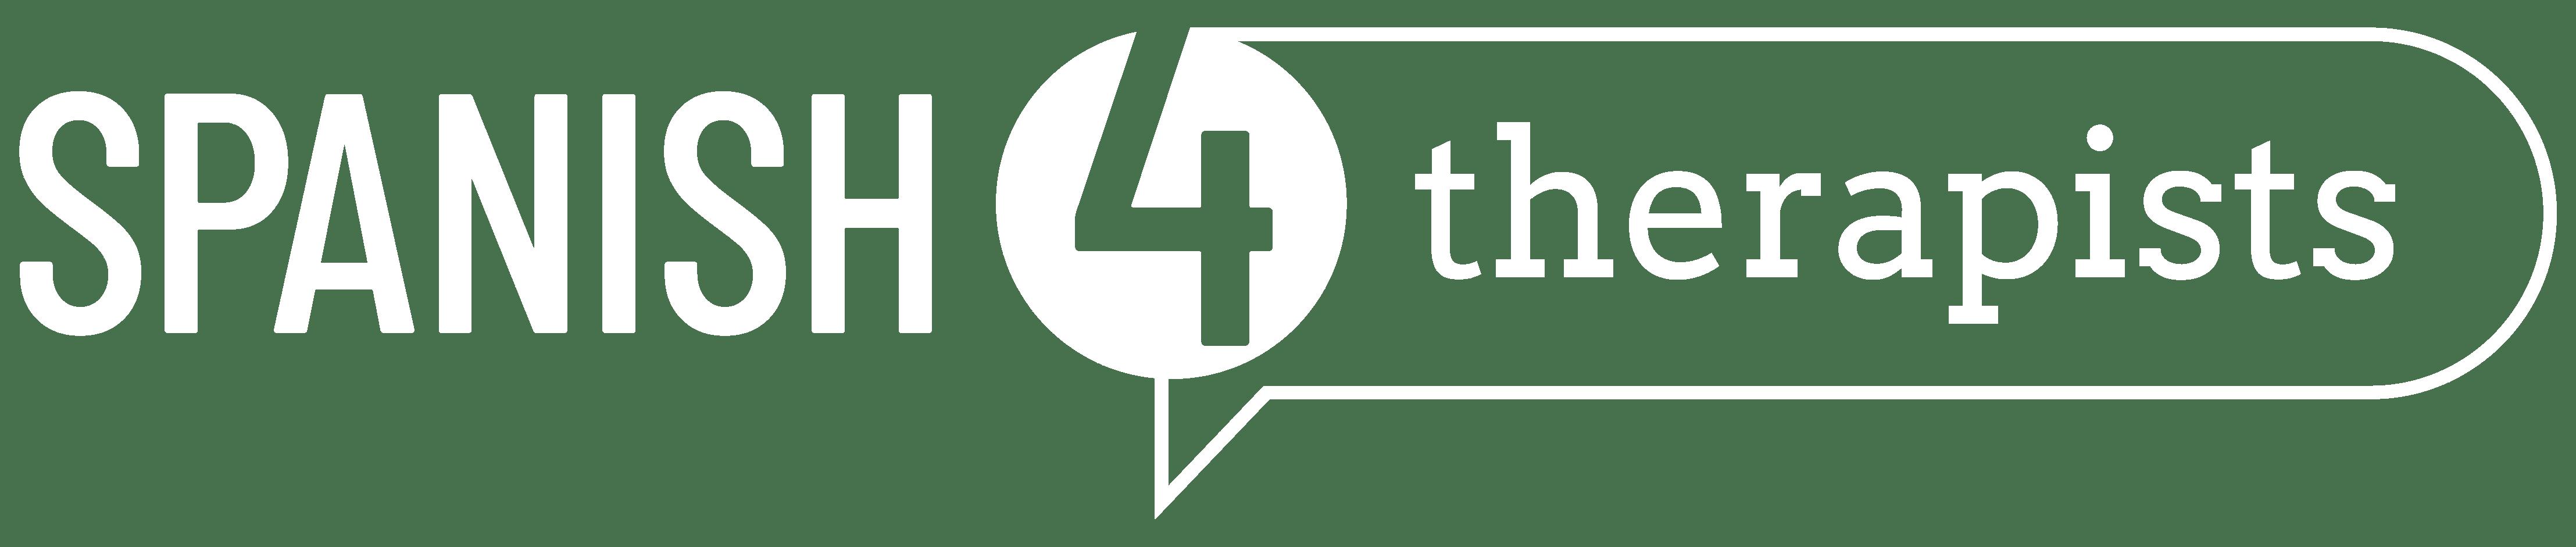 Spanish 4 Therapists